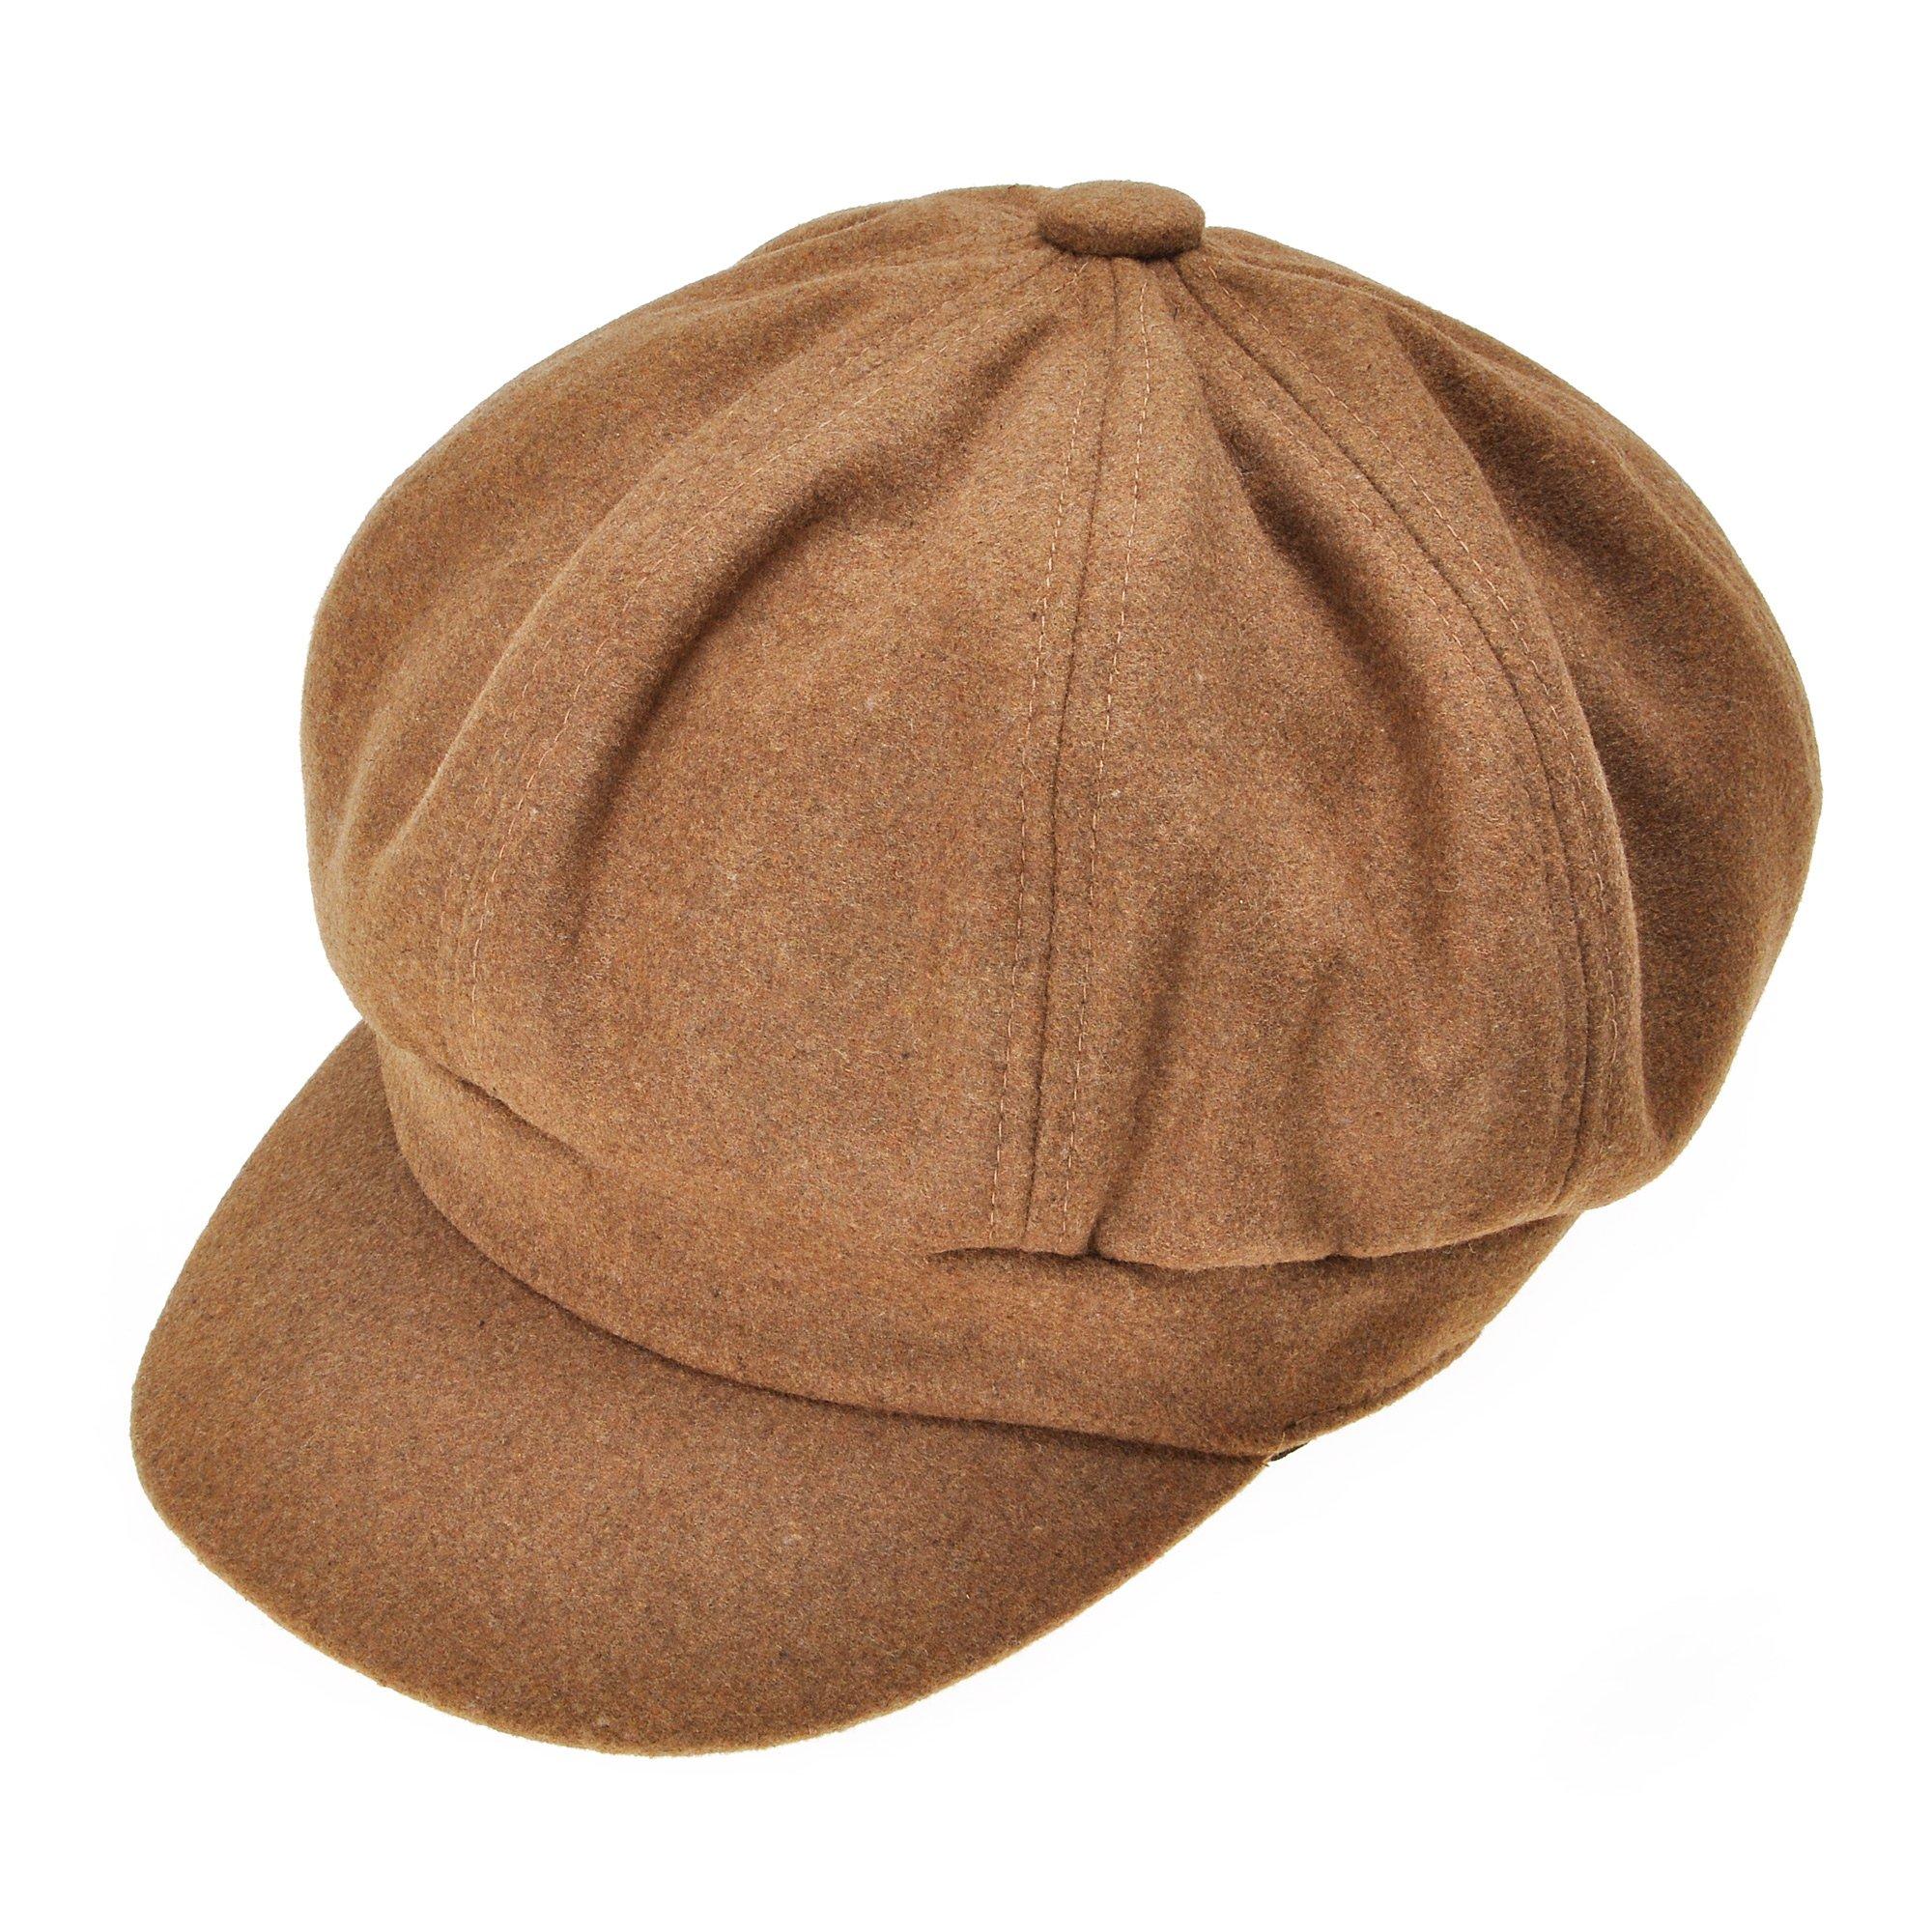 Womens Classic Newsboy Caps Visor 8 Panel Gatsby Apple Cabbie Hat, Camel